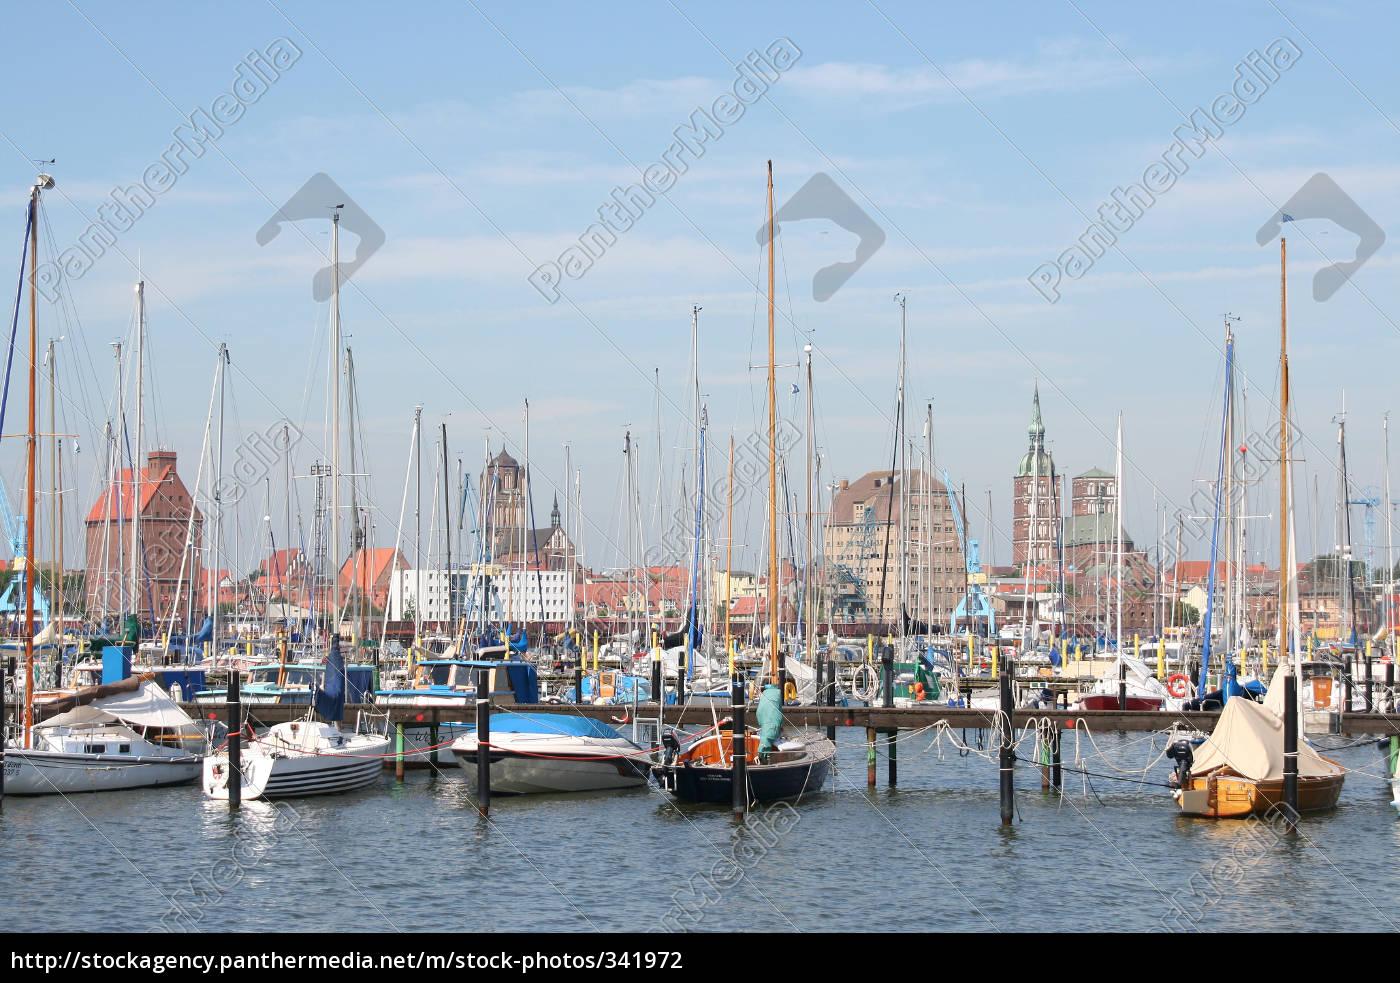 seglerhafen-3 - 341972